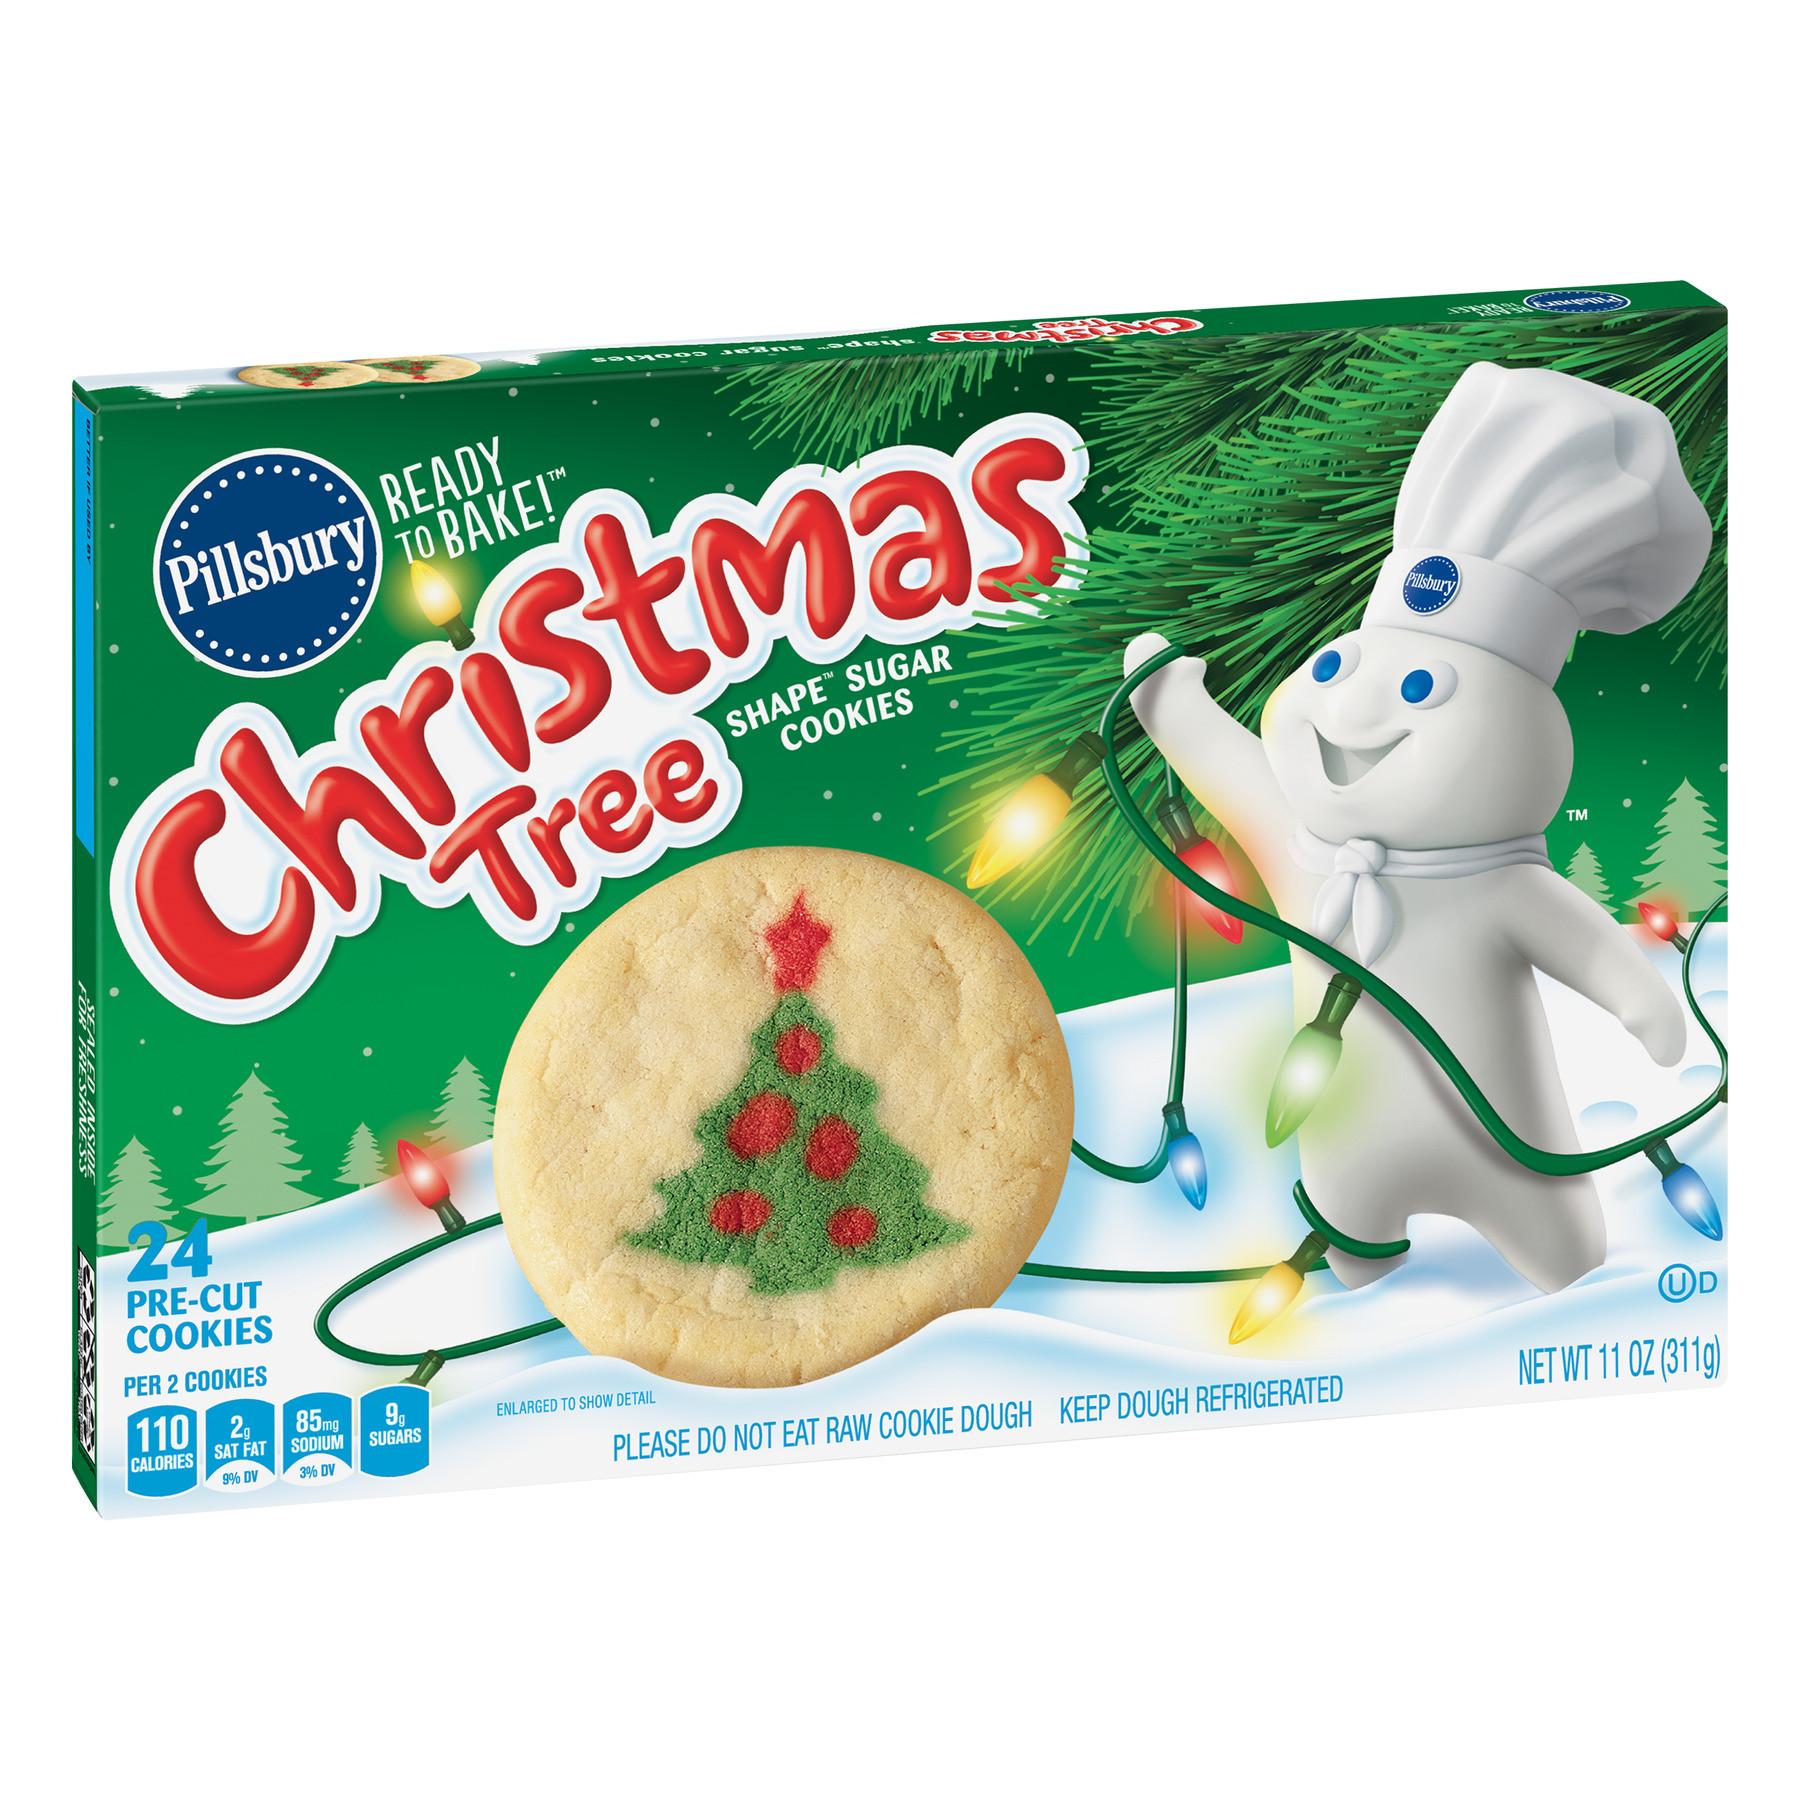 Walmart Christmas Cookies  Pillsbury Ready to Bake Christmas Tree Shape Sugar